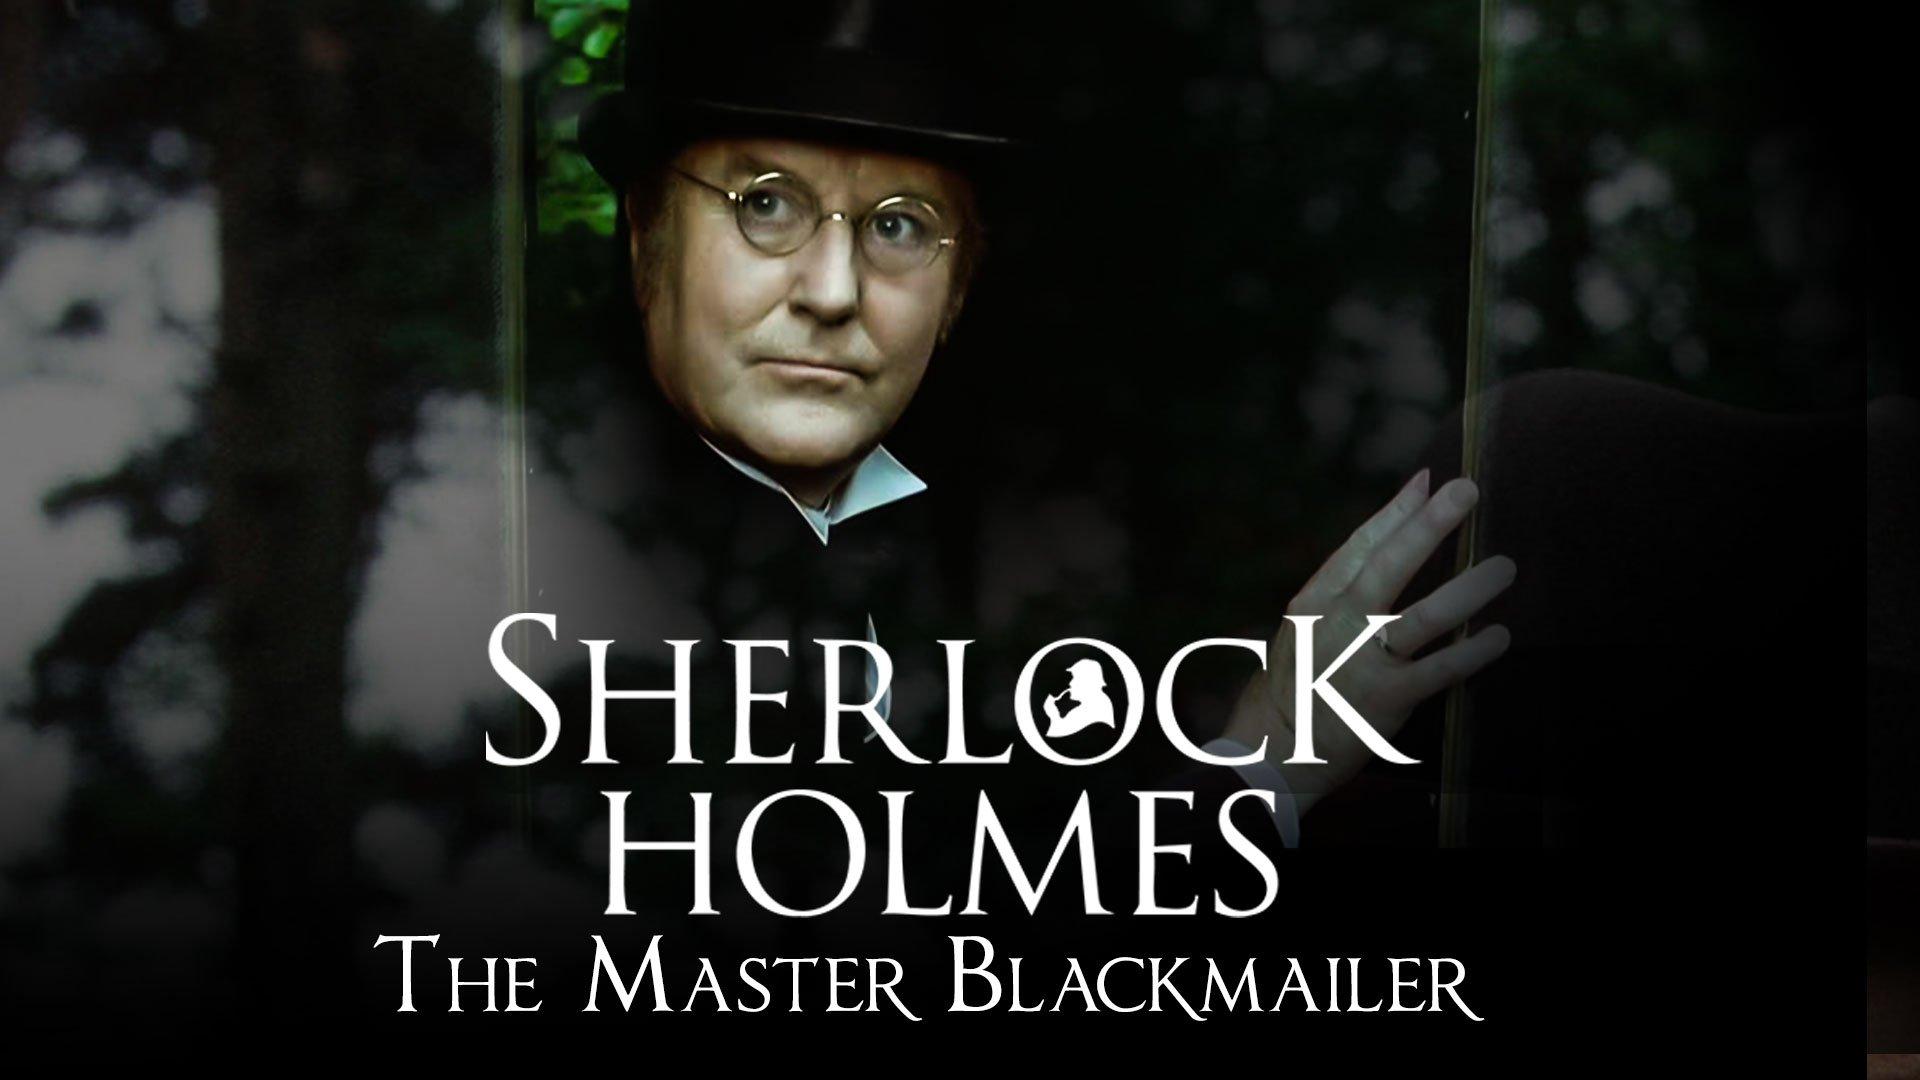 Sherlock Holmes: The Master Blackmailer on BritBox UK